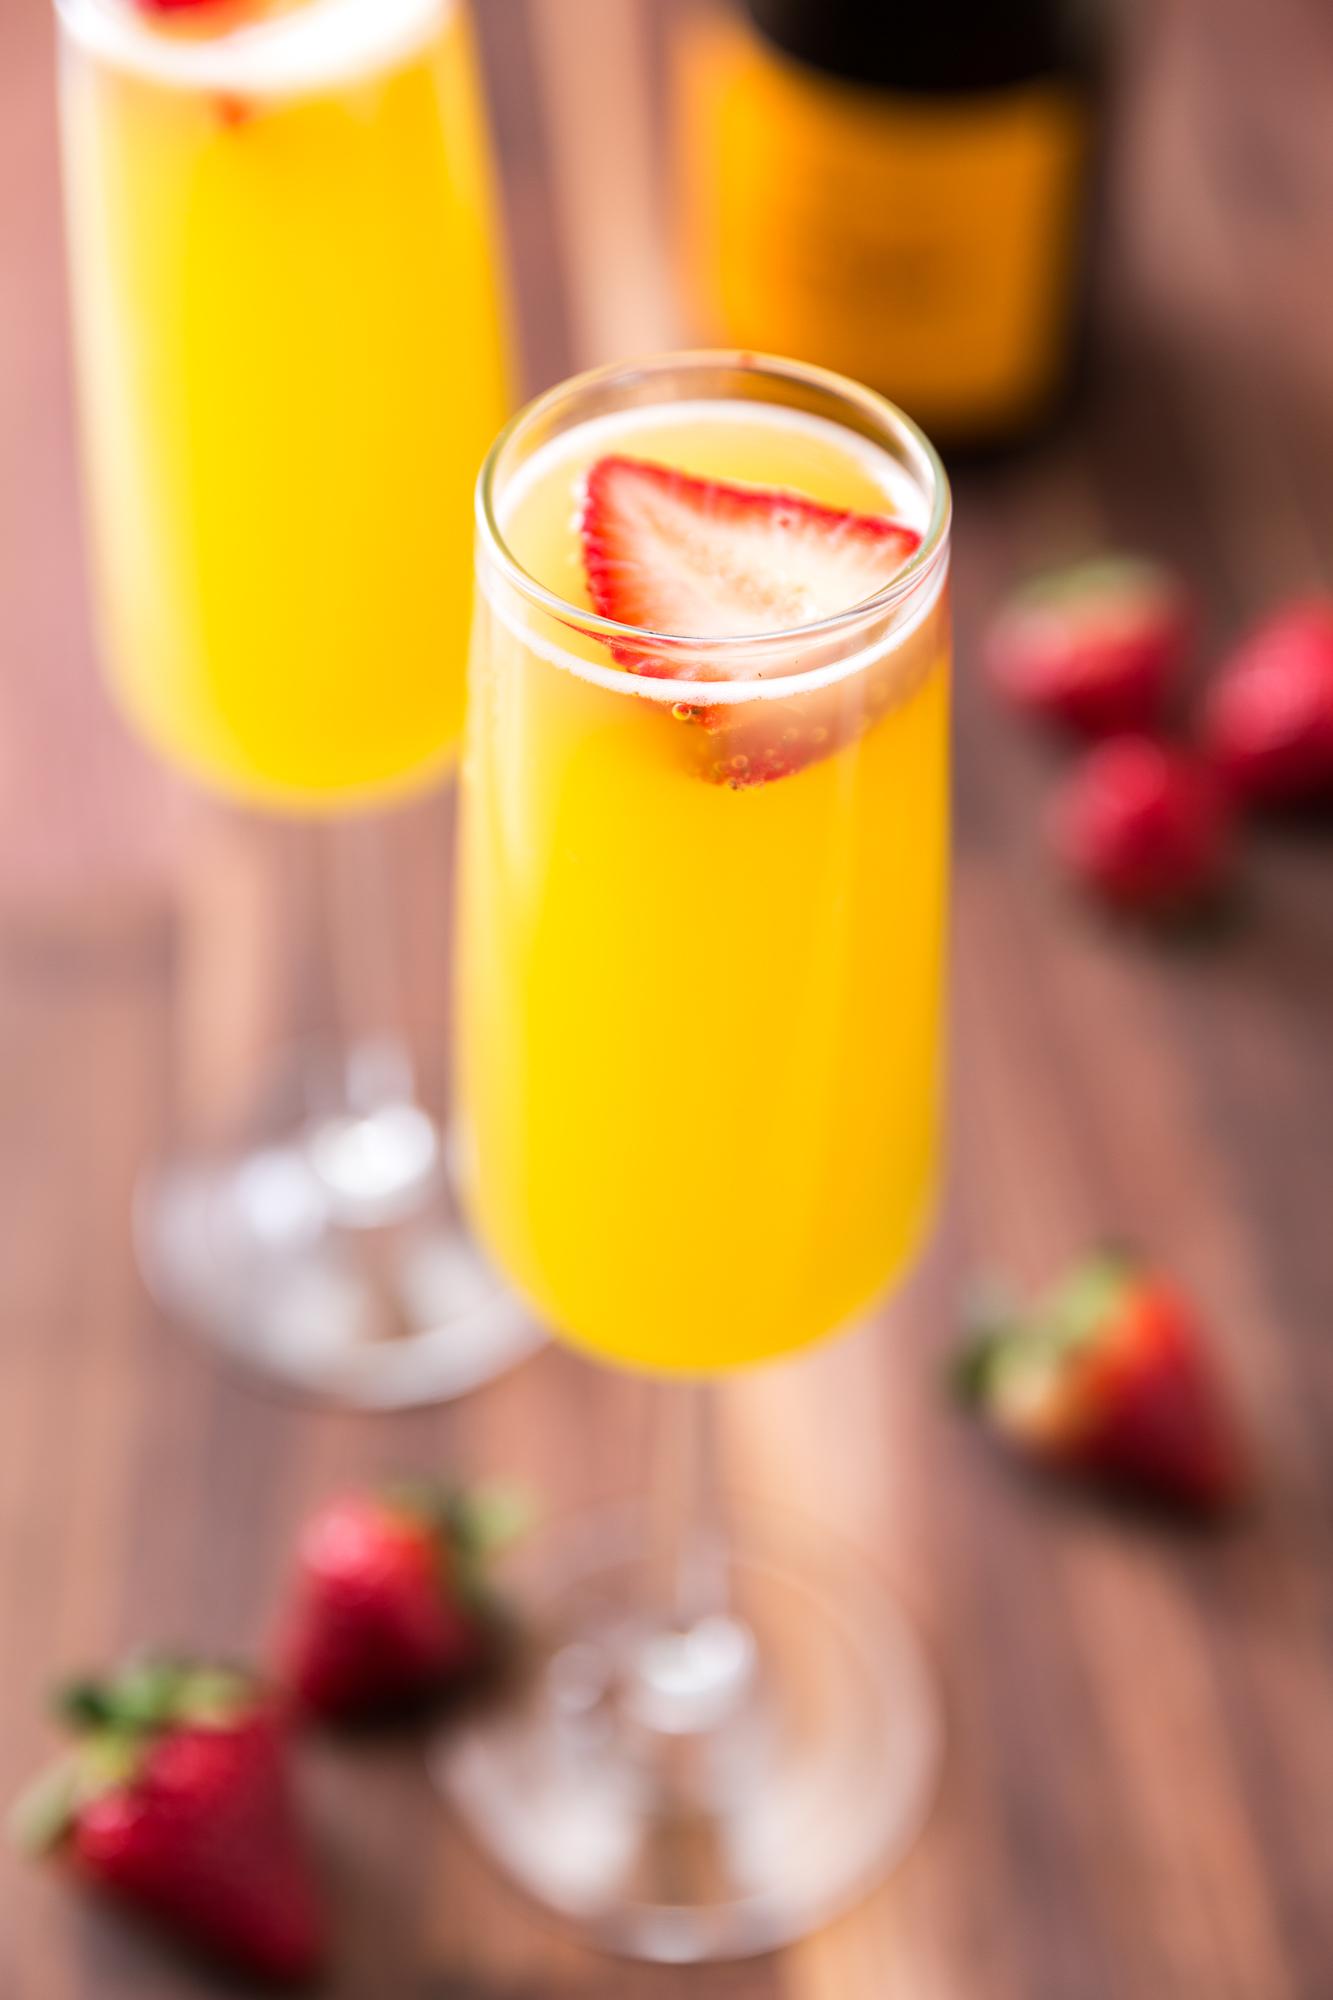 Best Pineapple Strawberry Mimosas Recipe How To Make Pineapple Strawberry Mimosas